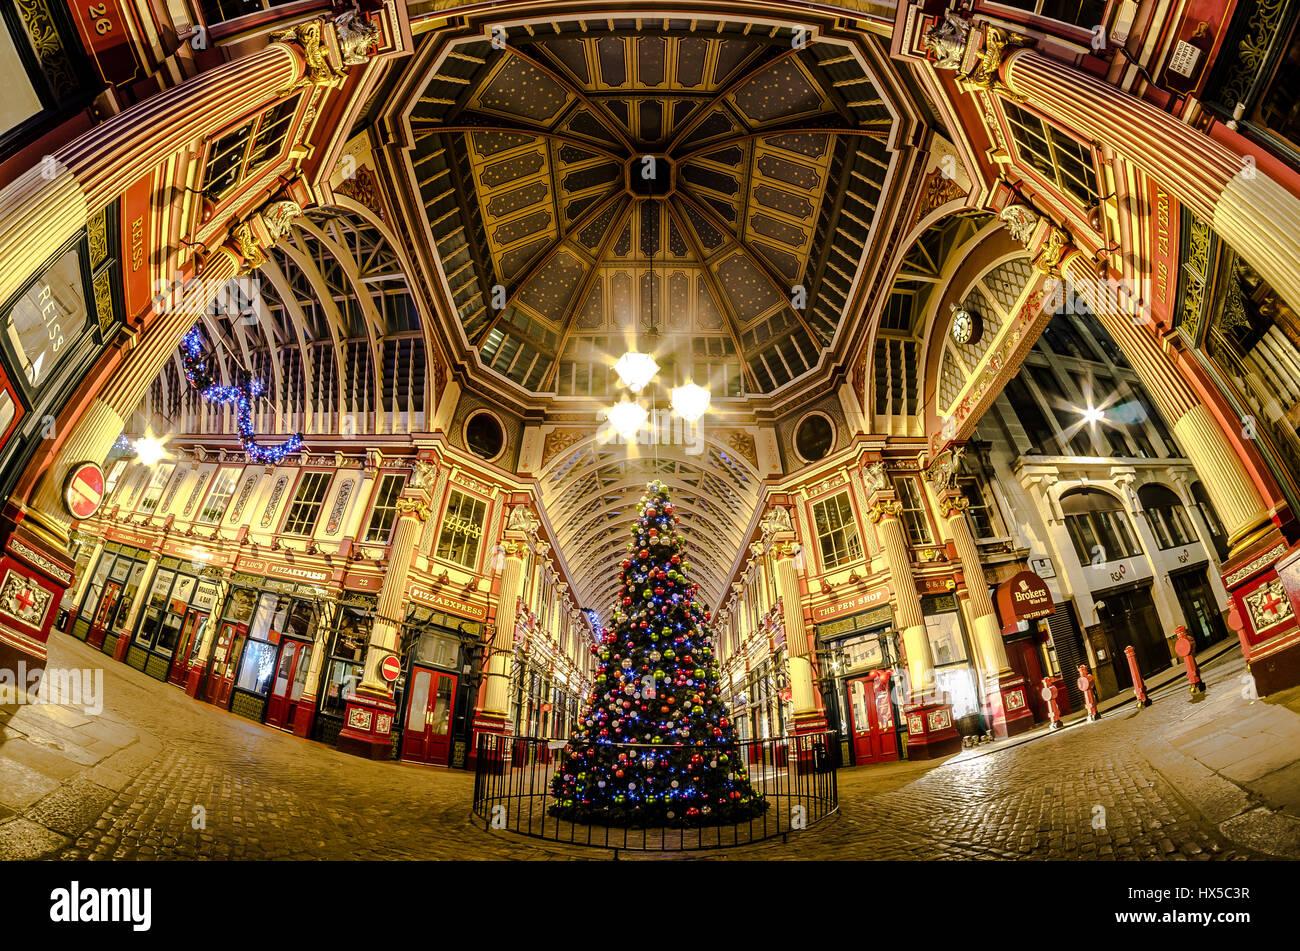 Leadenhall Market christmas tree fisheye scene - Stock Image